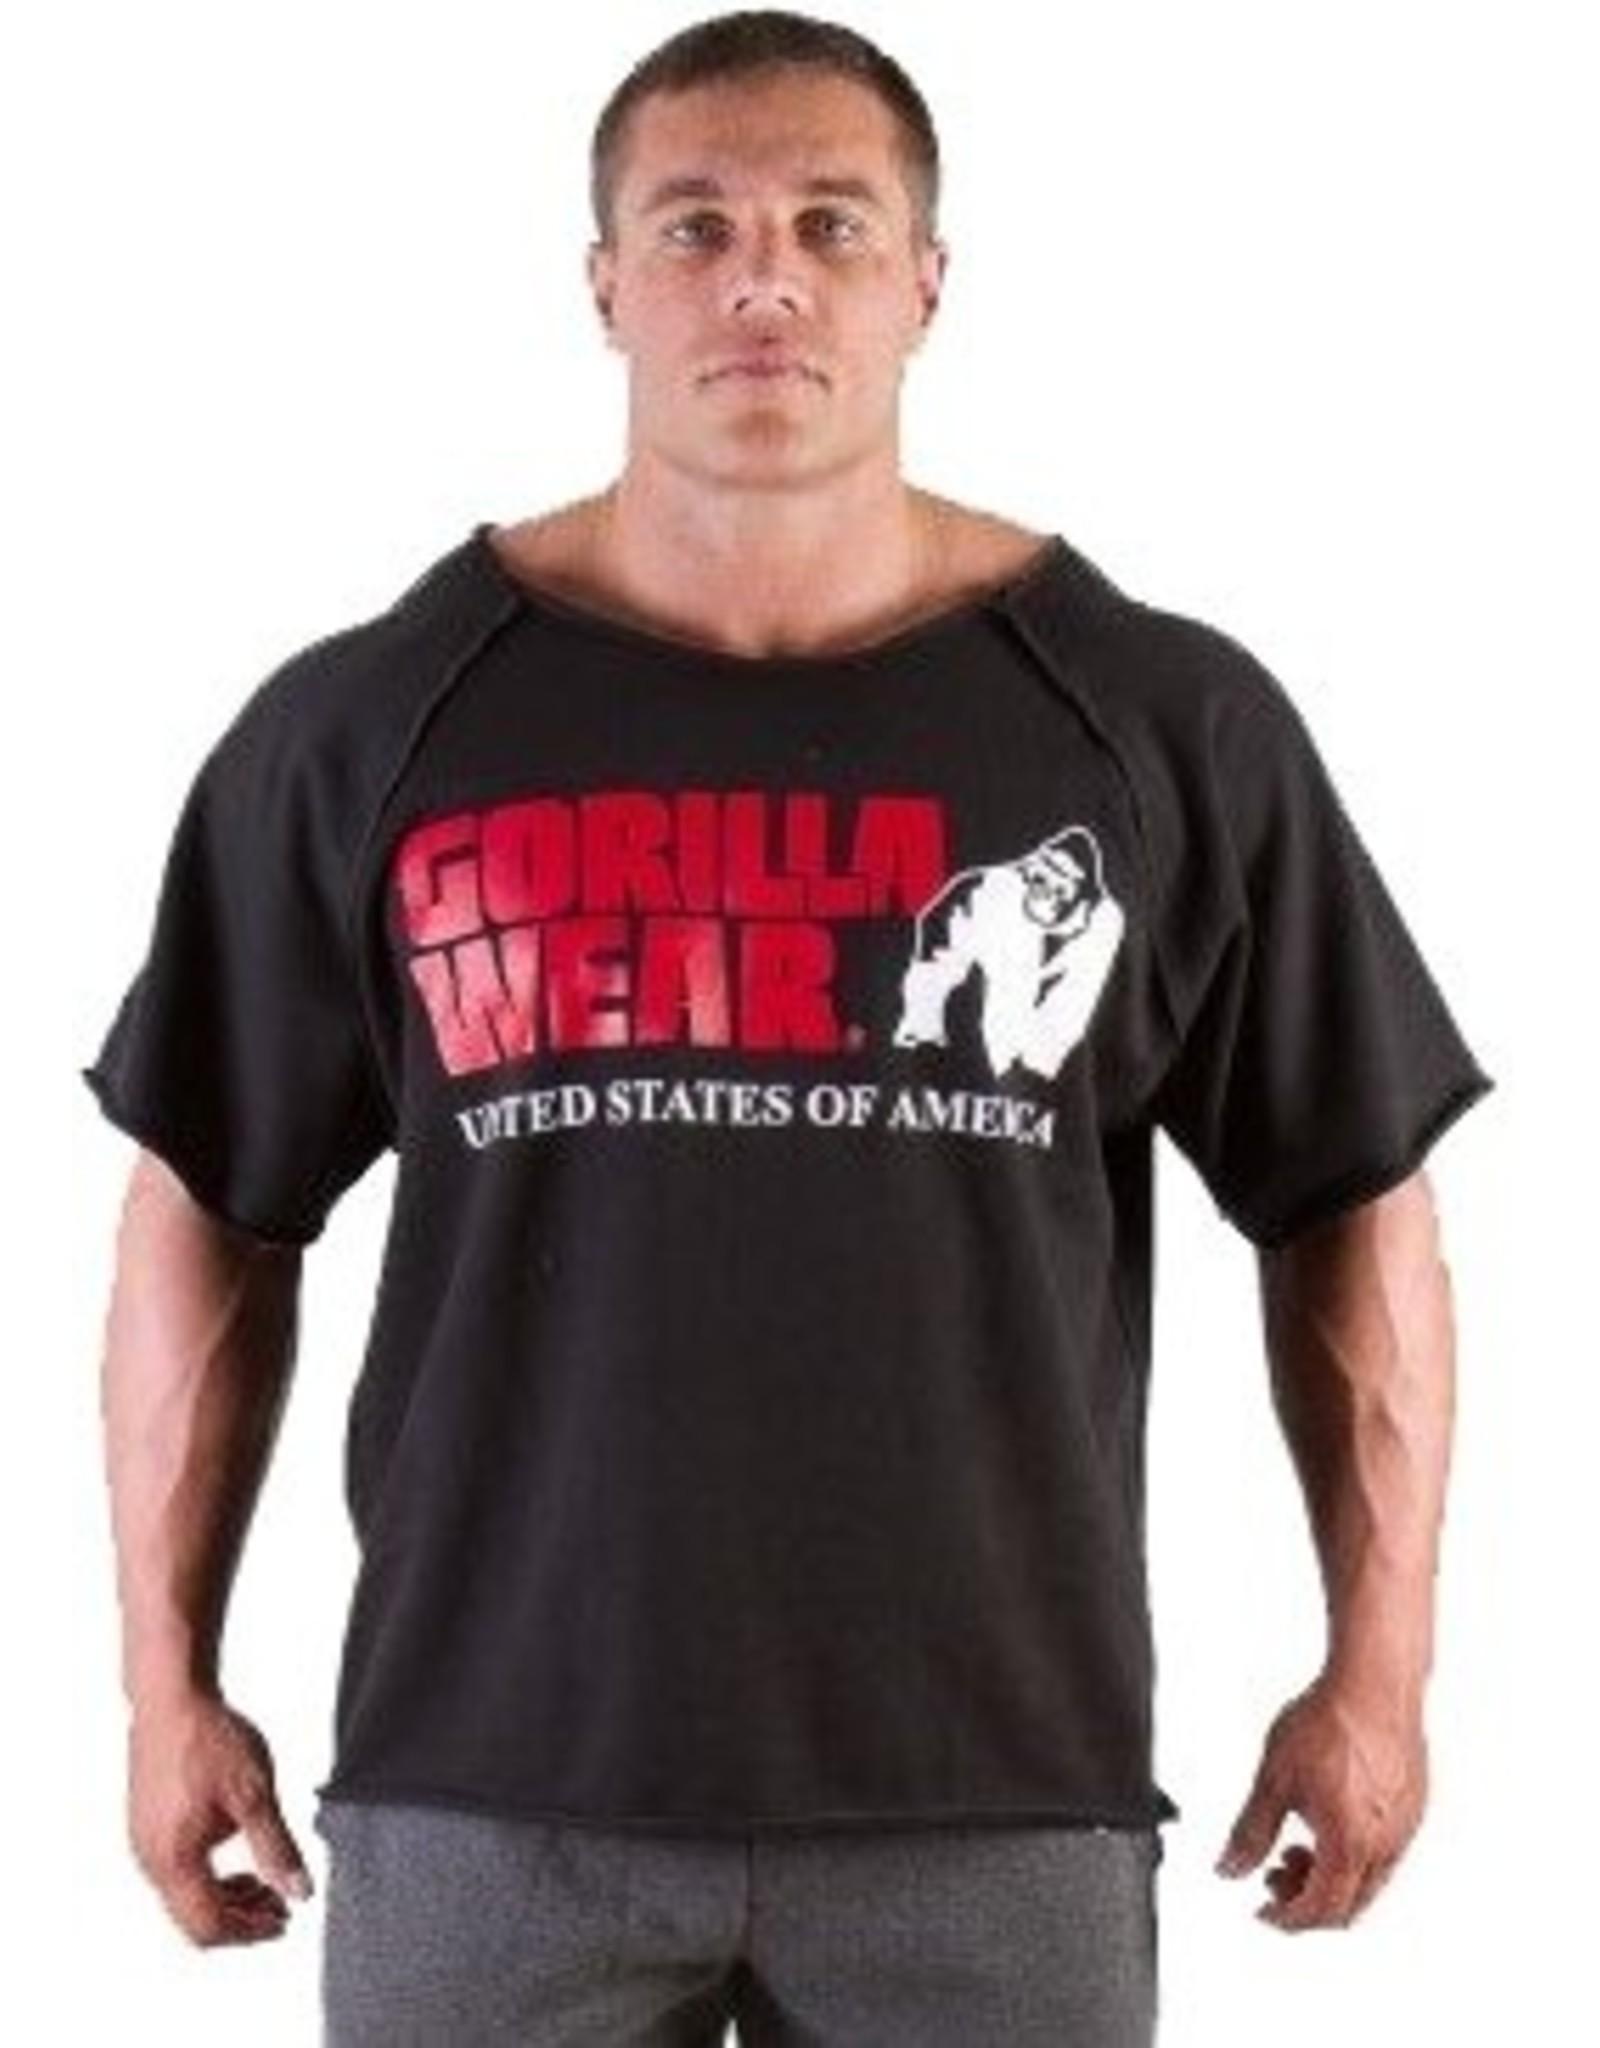 Gorilla Wear Classic Workout Top - Black